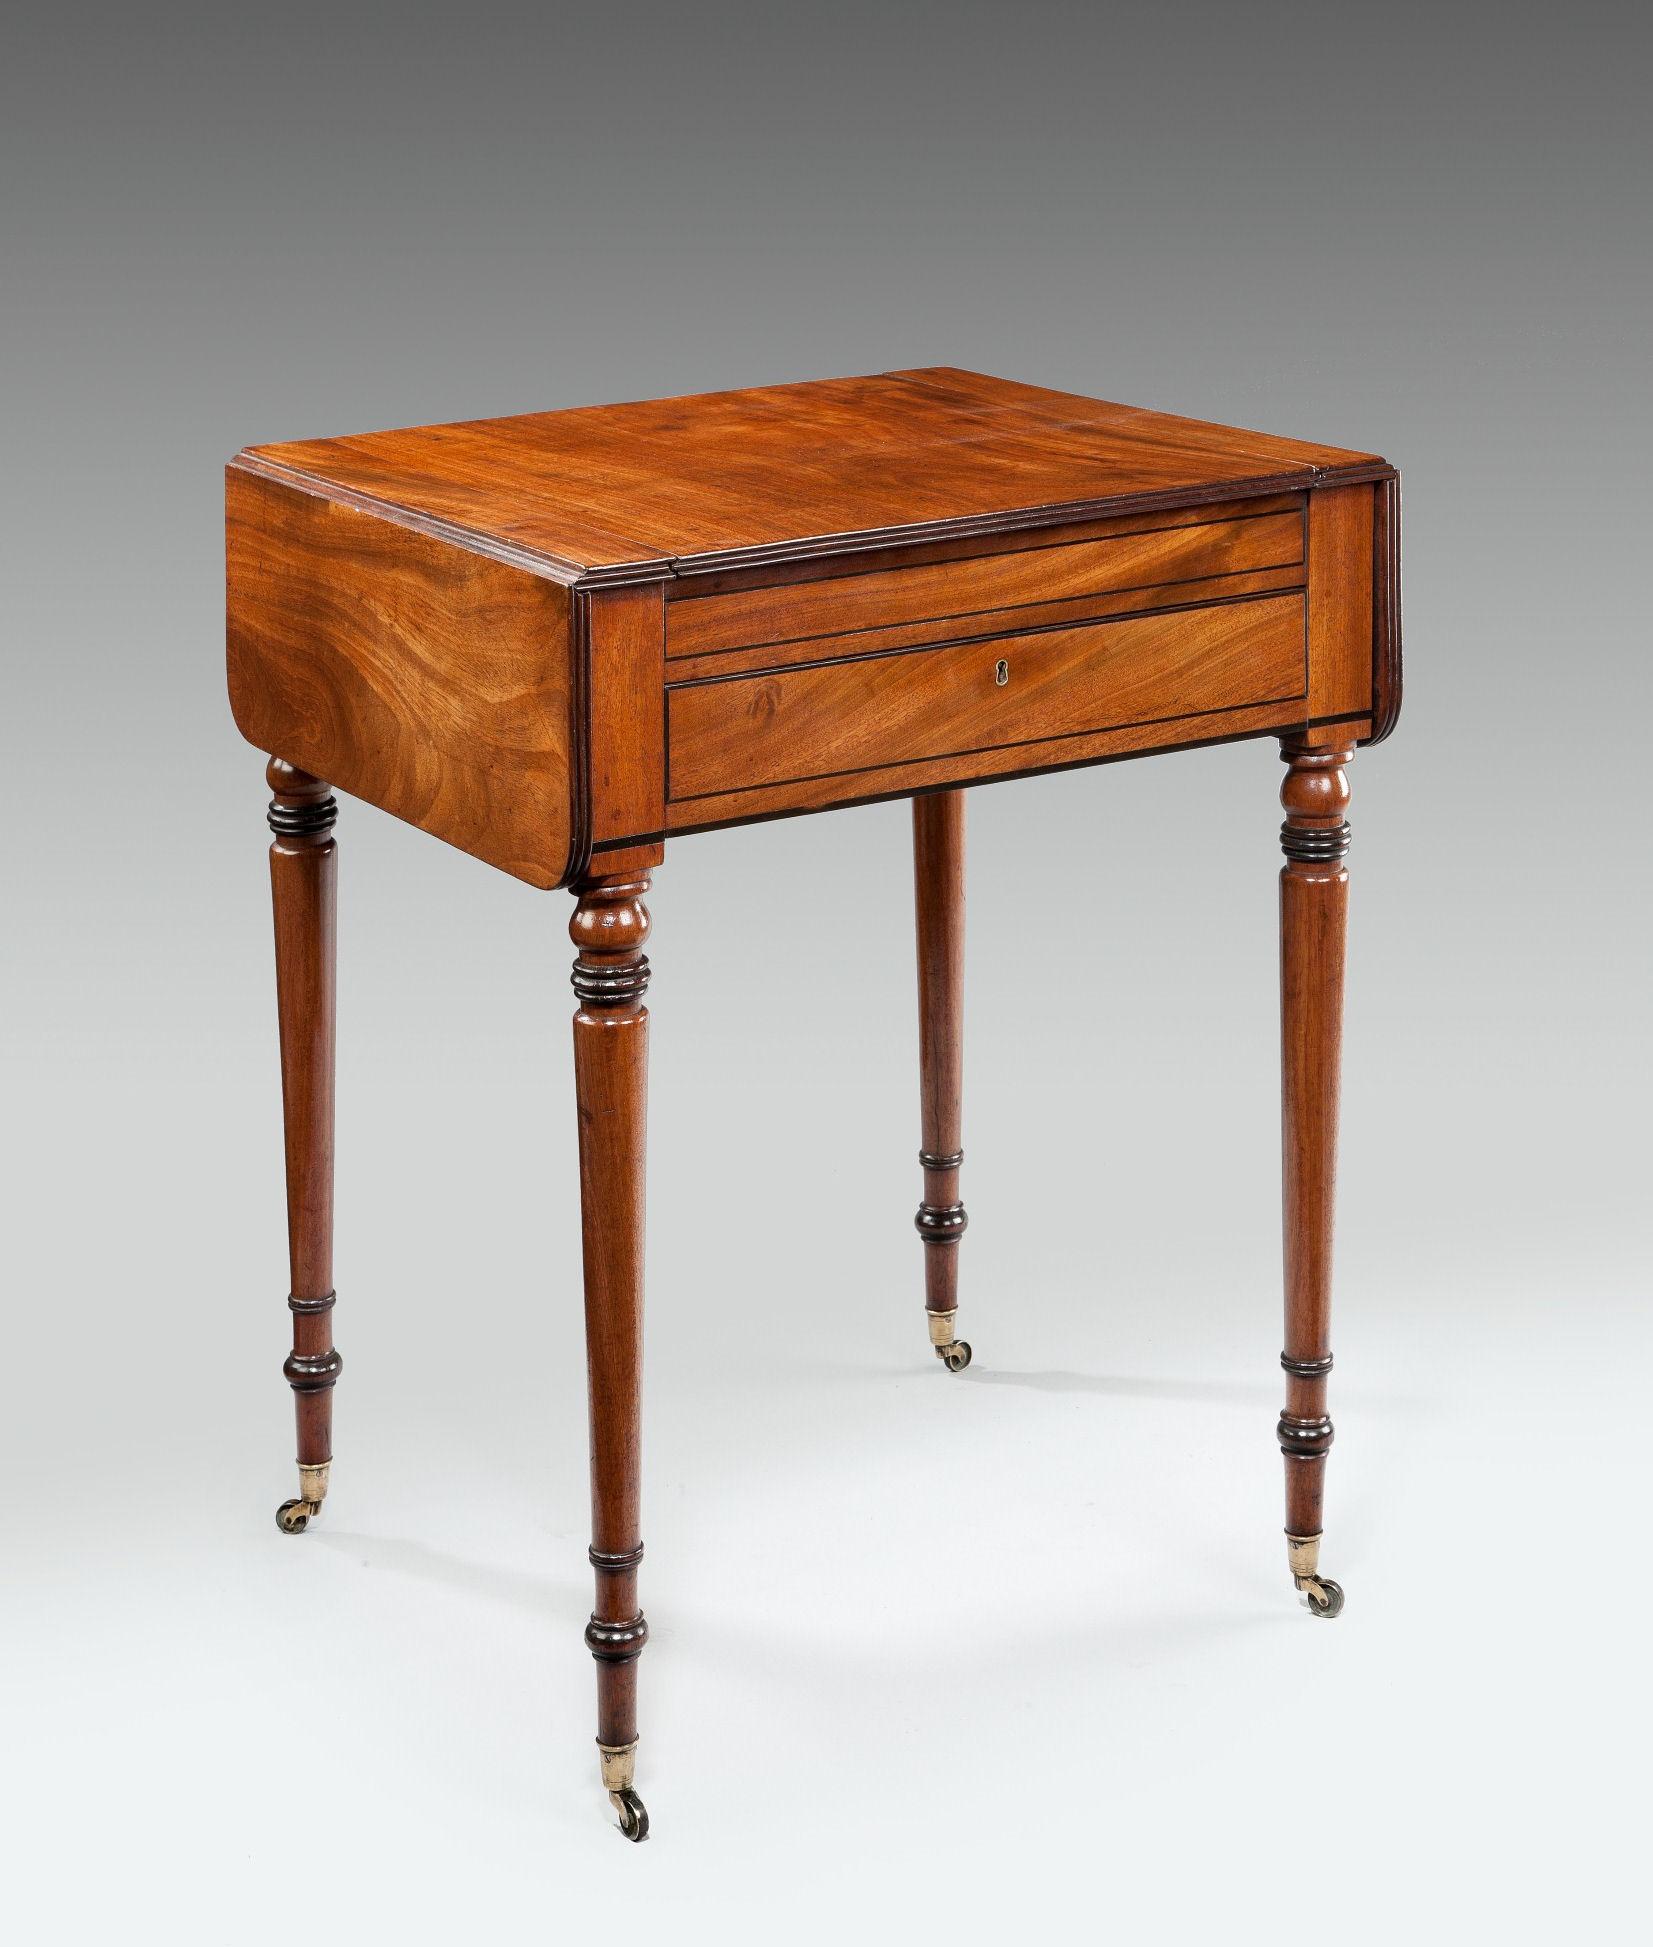 Antique Regency Pembroke Games Chess Backgammon Table